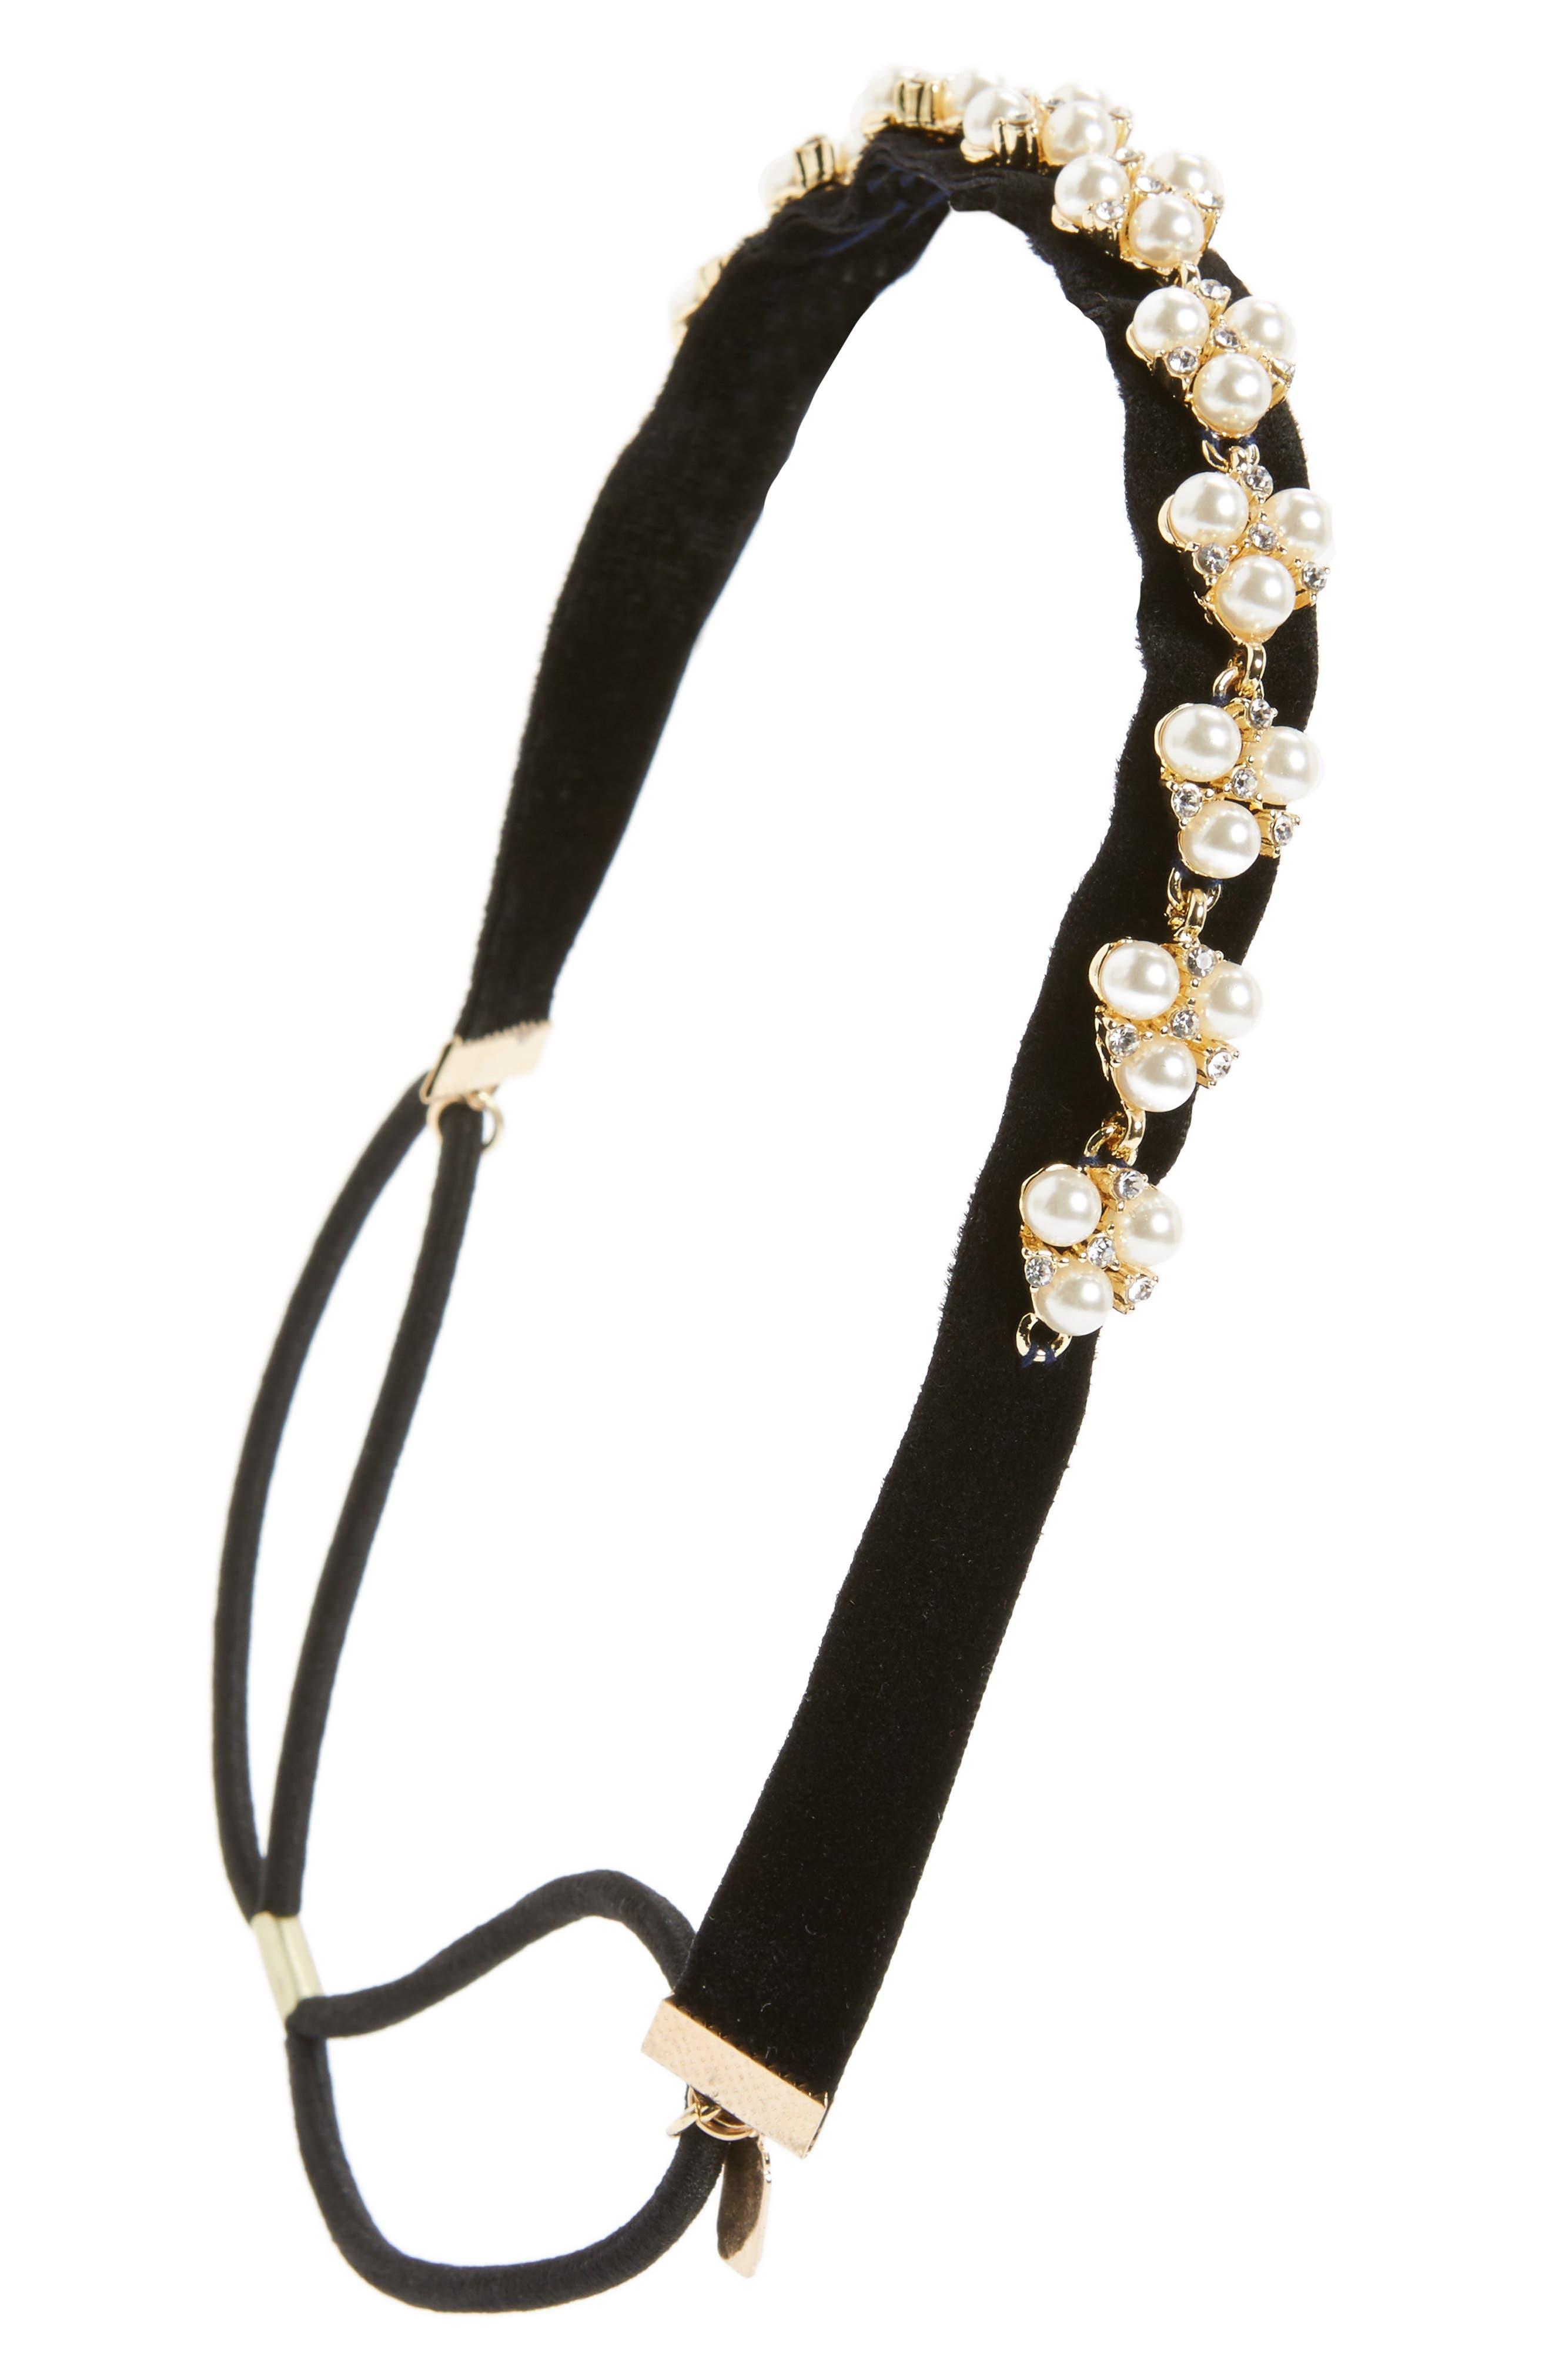 Main Image - Tasha Crystal & Imitation Pearl Embellished Headwrap